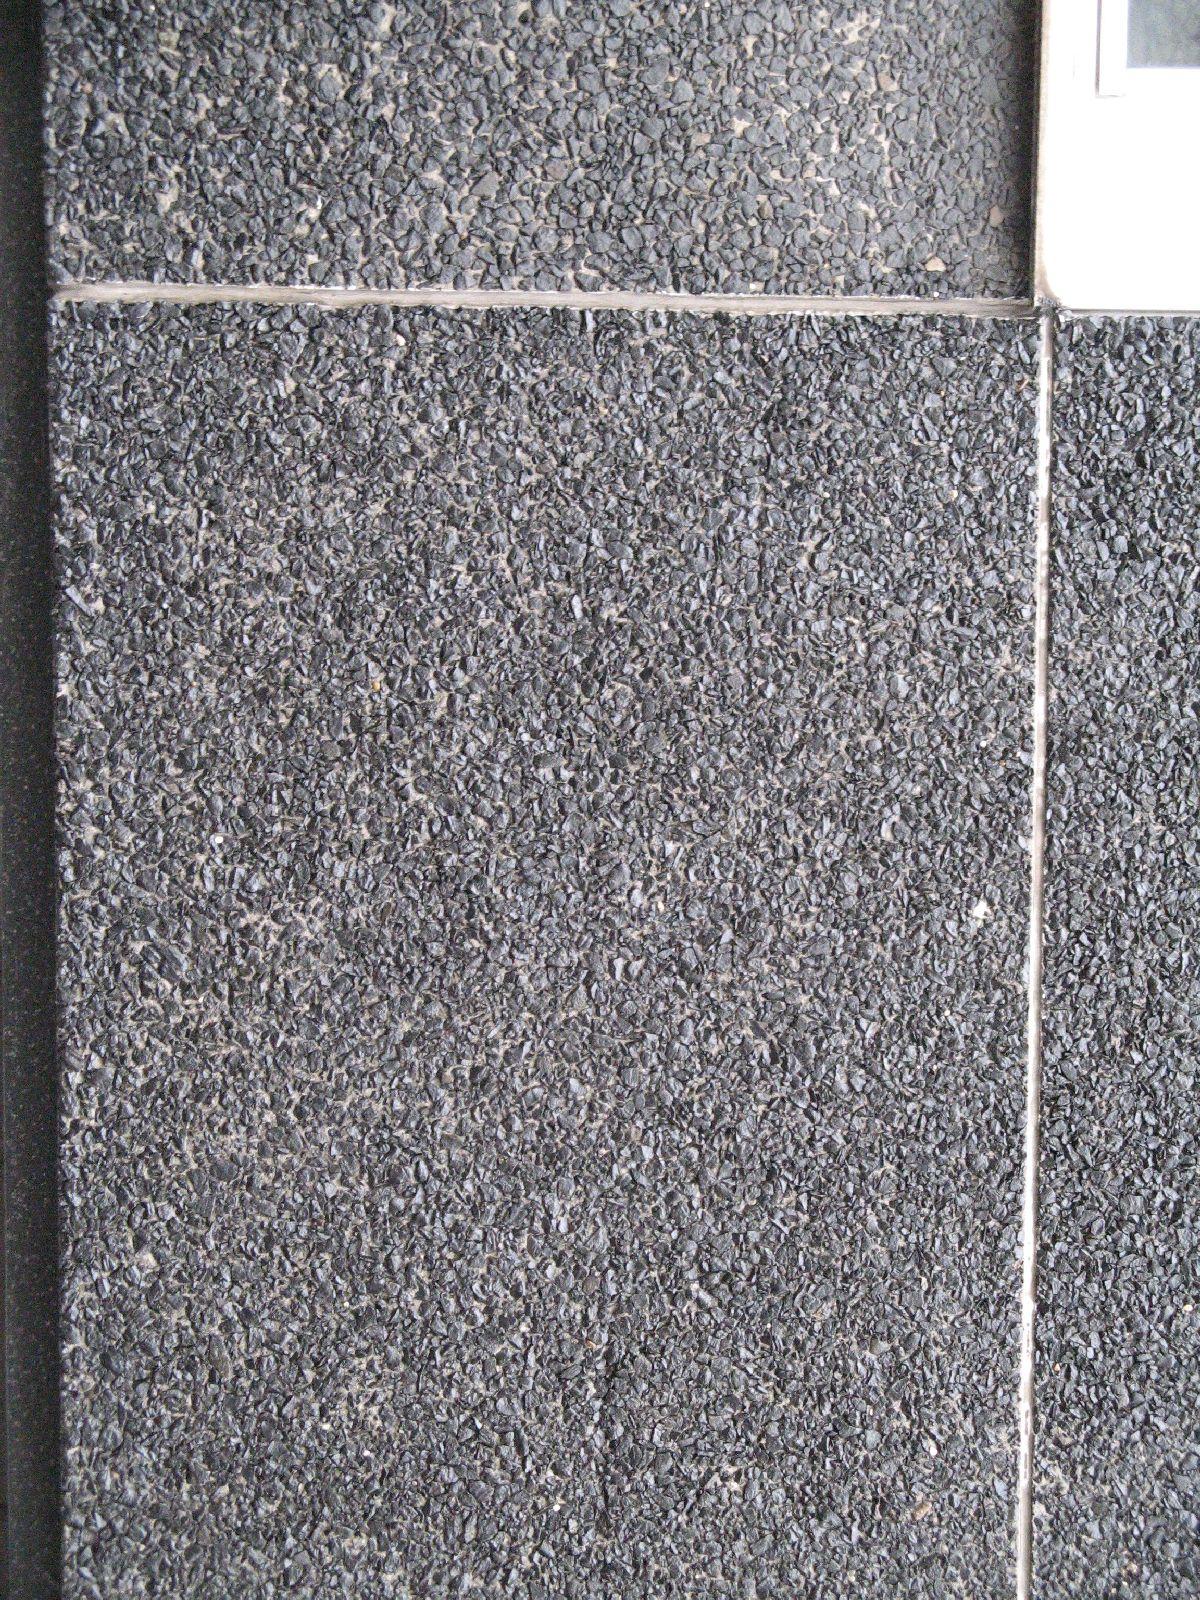 Stone_Texture_B_04031